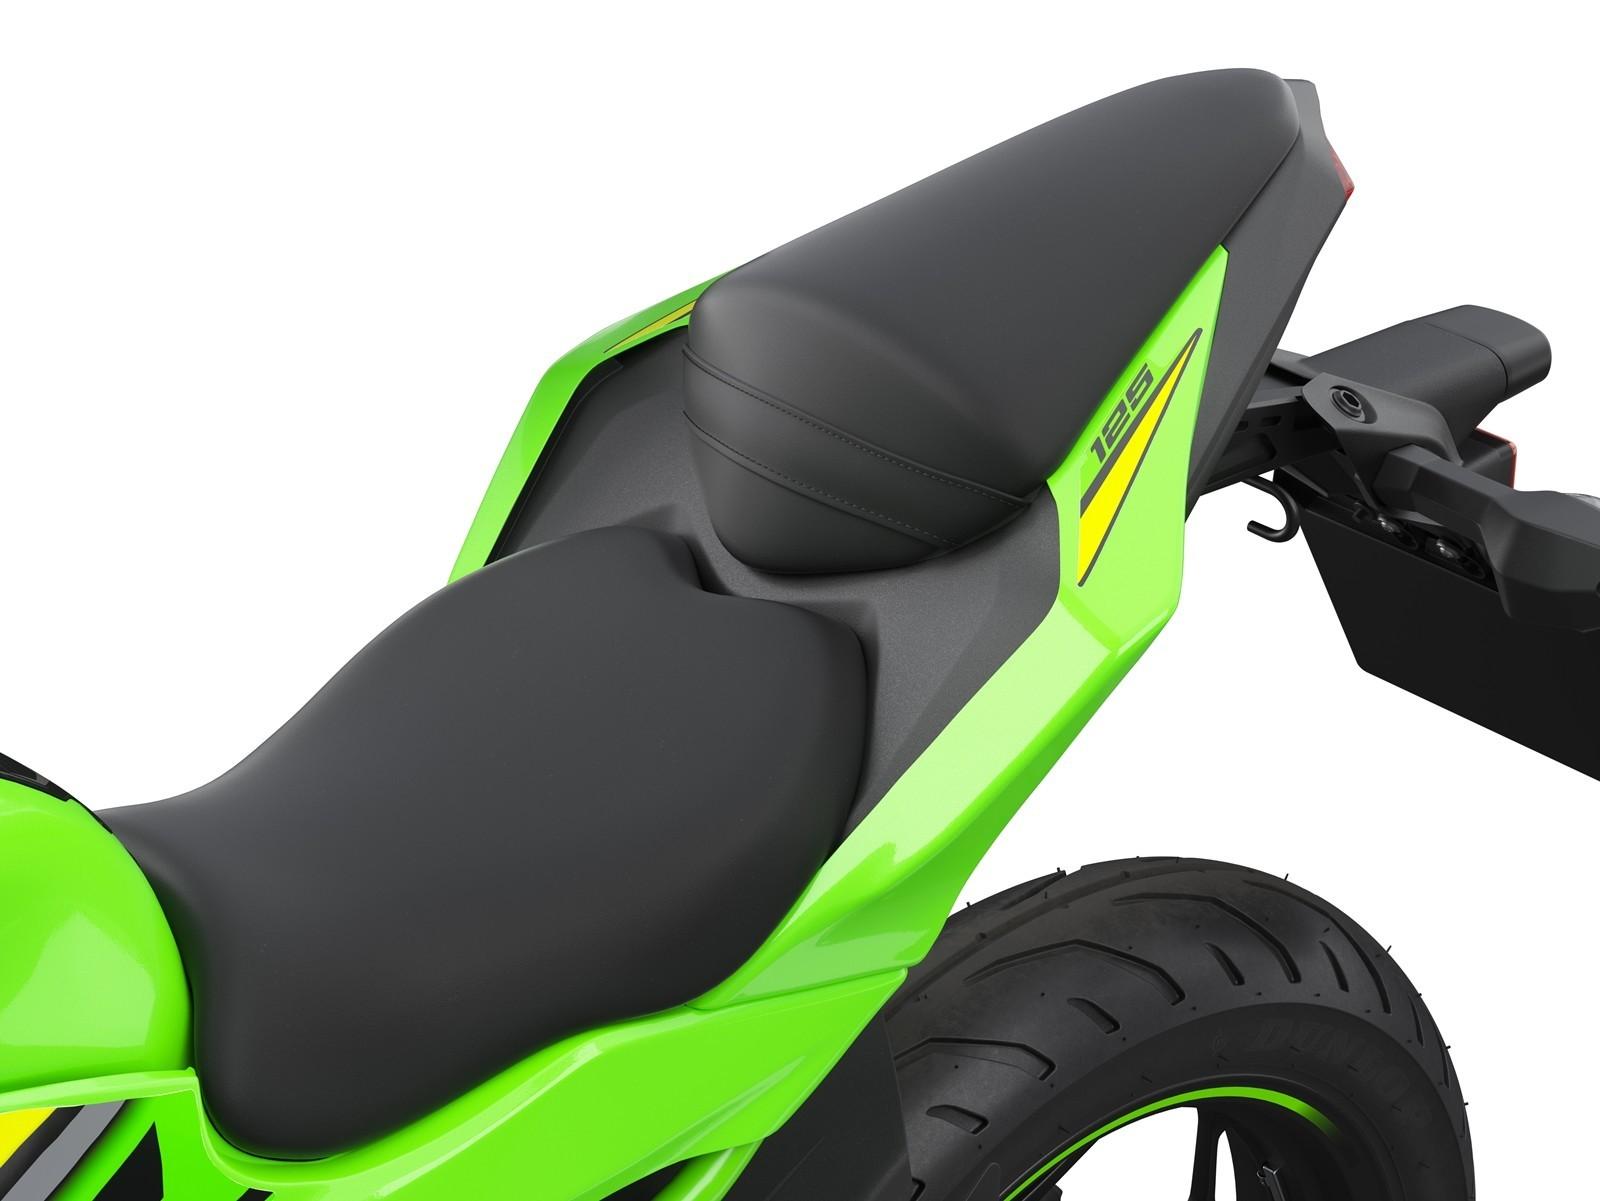 Kawasaki Ninja 125 Dm 10